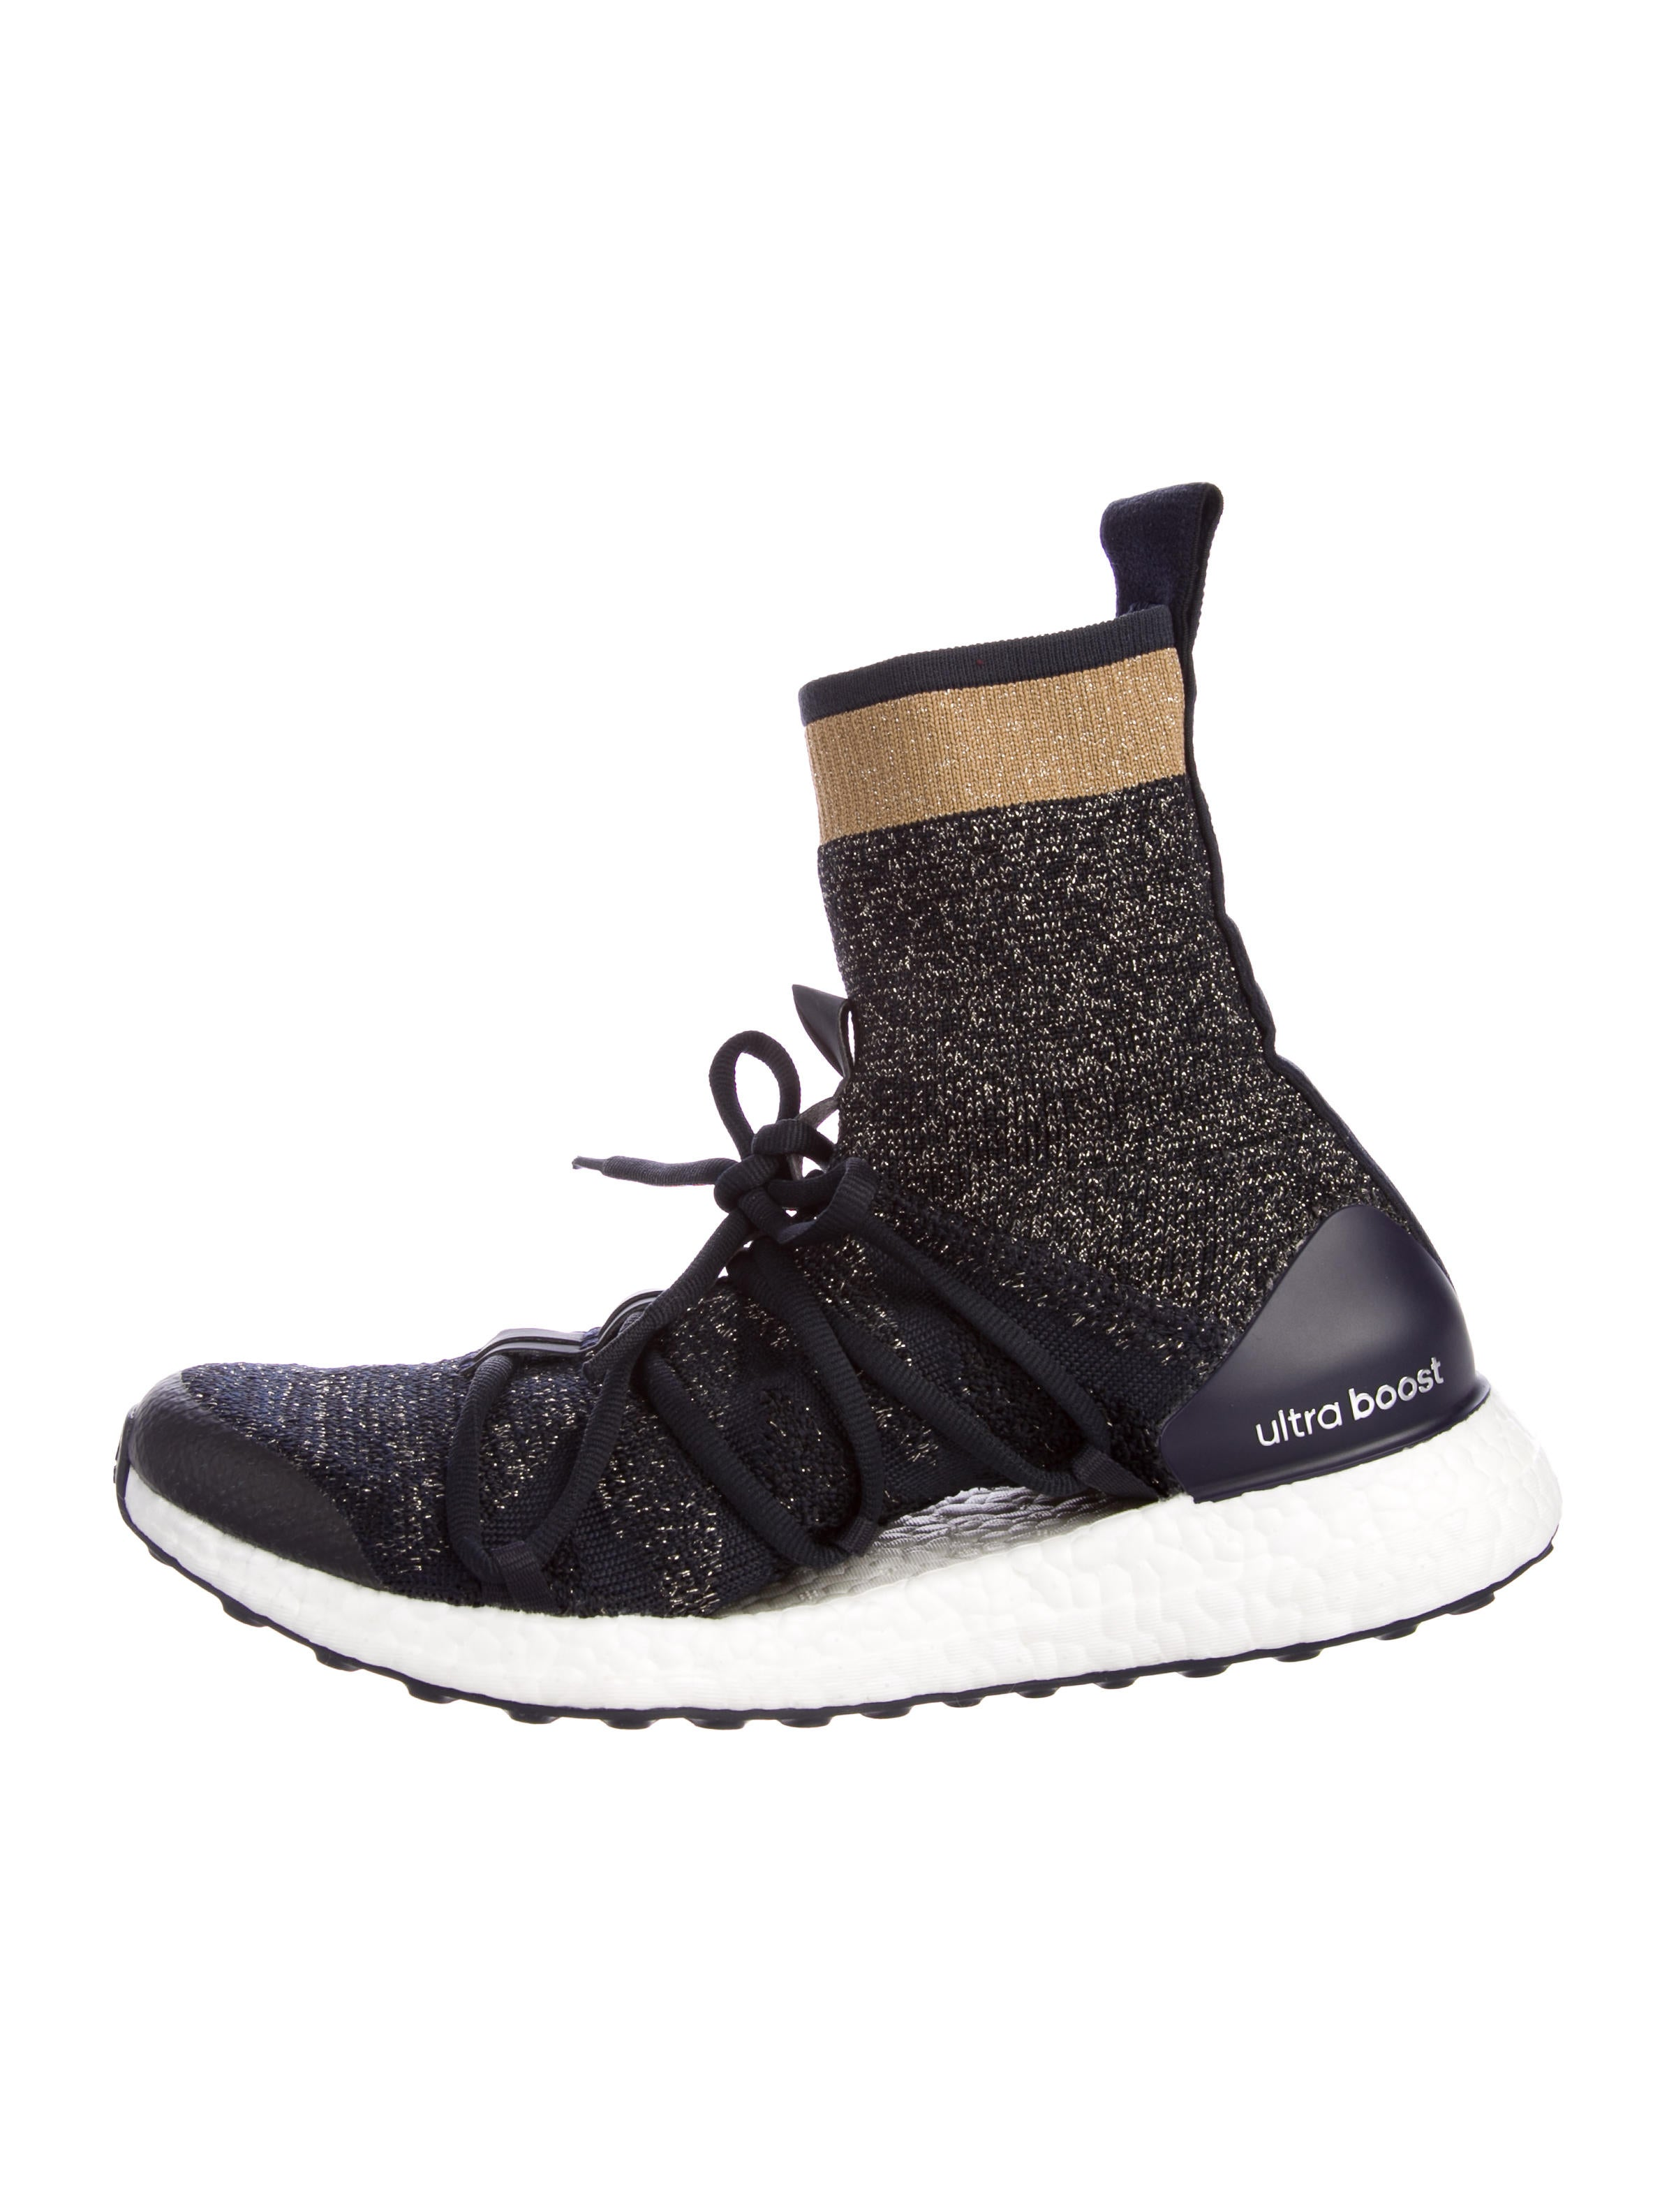 Bottega Veneta Black UltraBOOST x Mid Sneakers avbzVfqekn